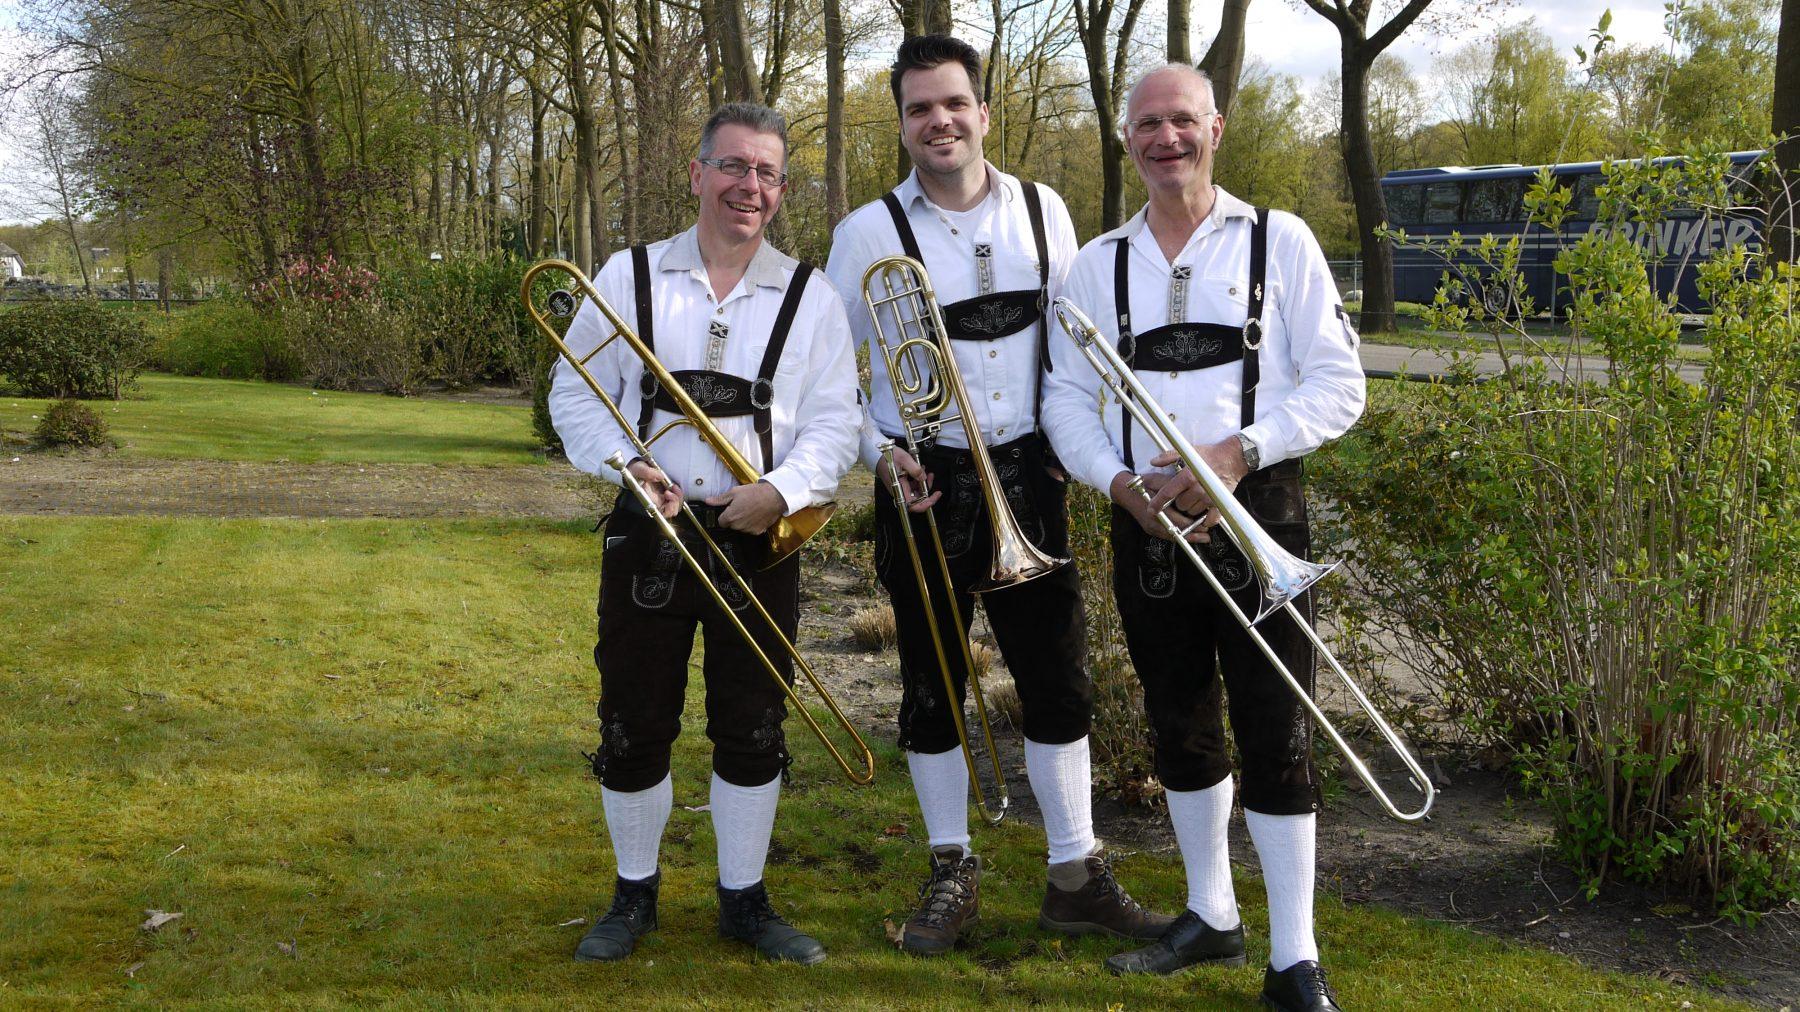 Eschlanderkapel trombonisten 2016